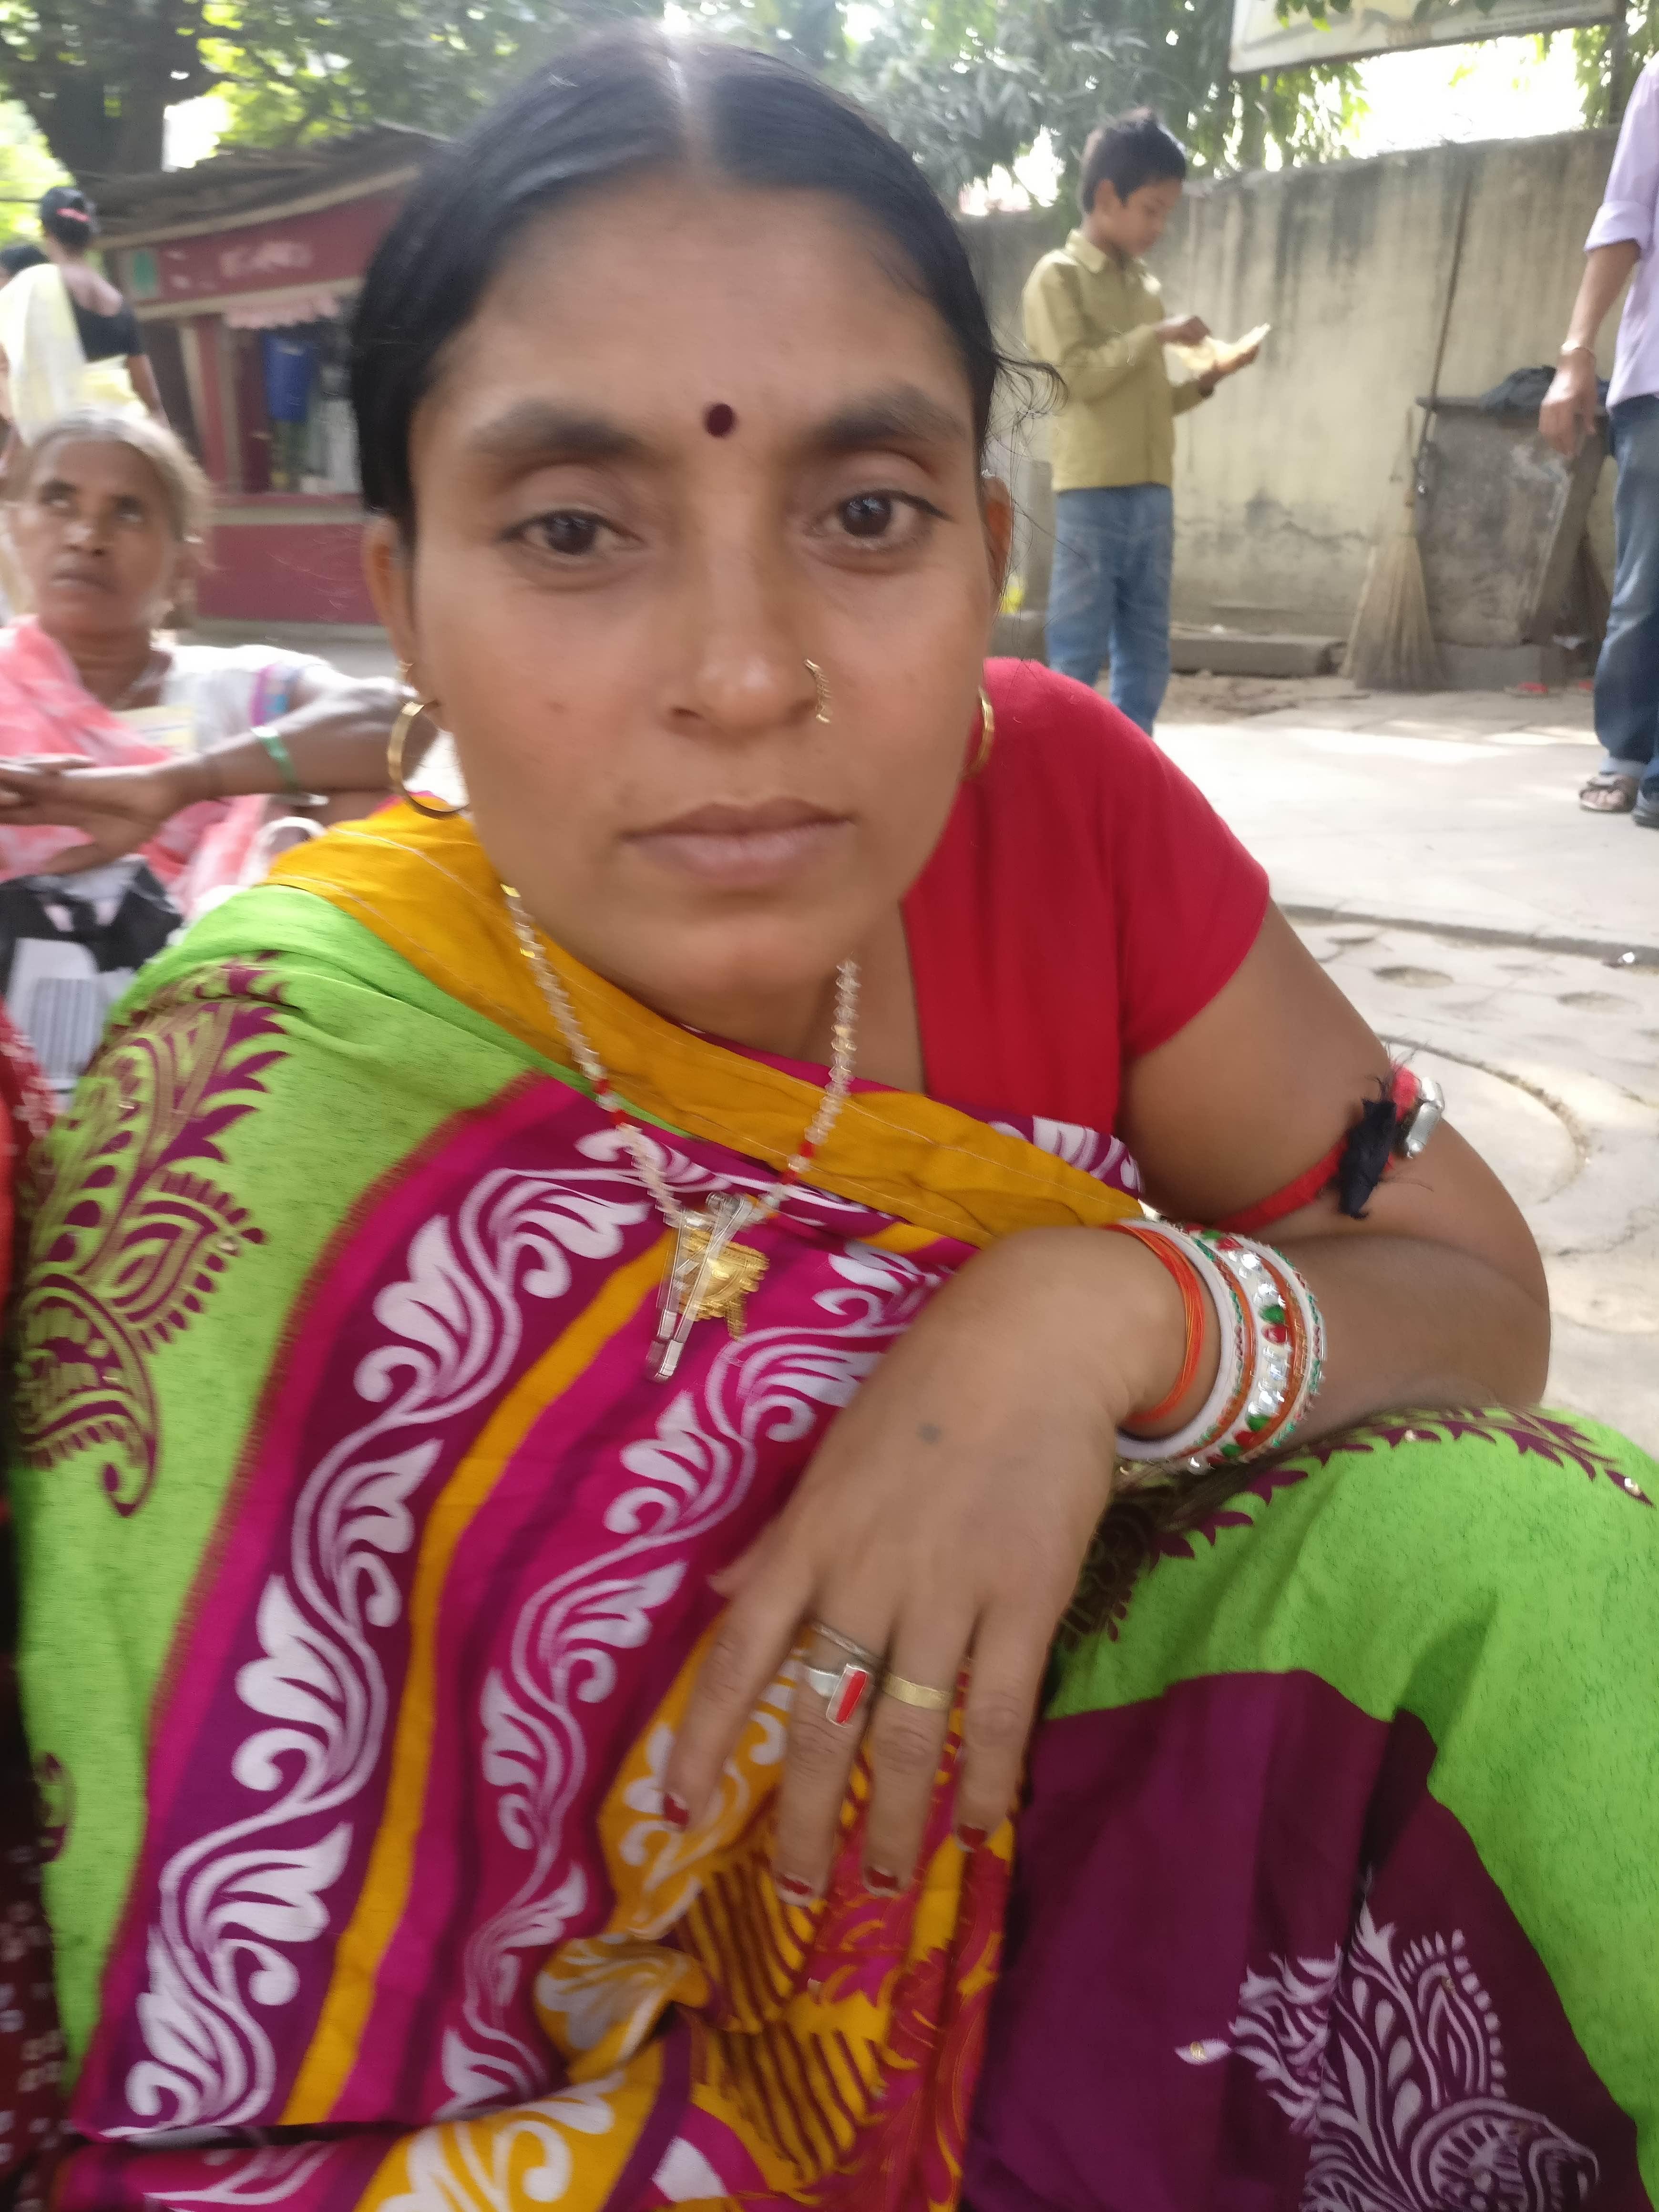 Lakshmaniya Devi. Credit: Ajoy Ashirwad Mahaprashasta/The Wire